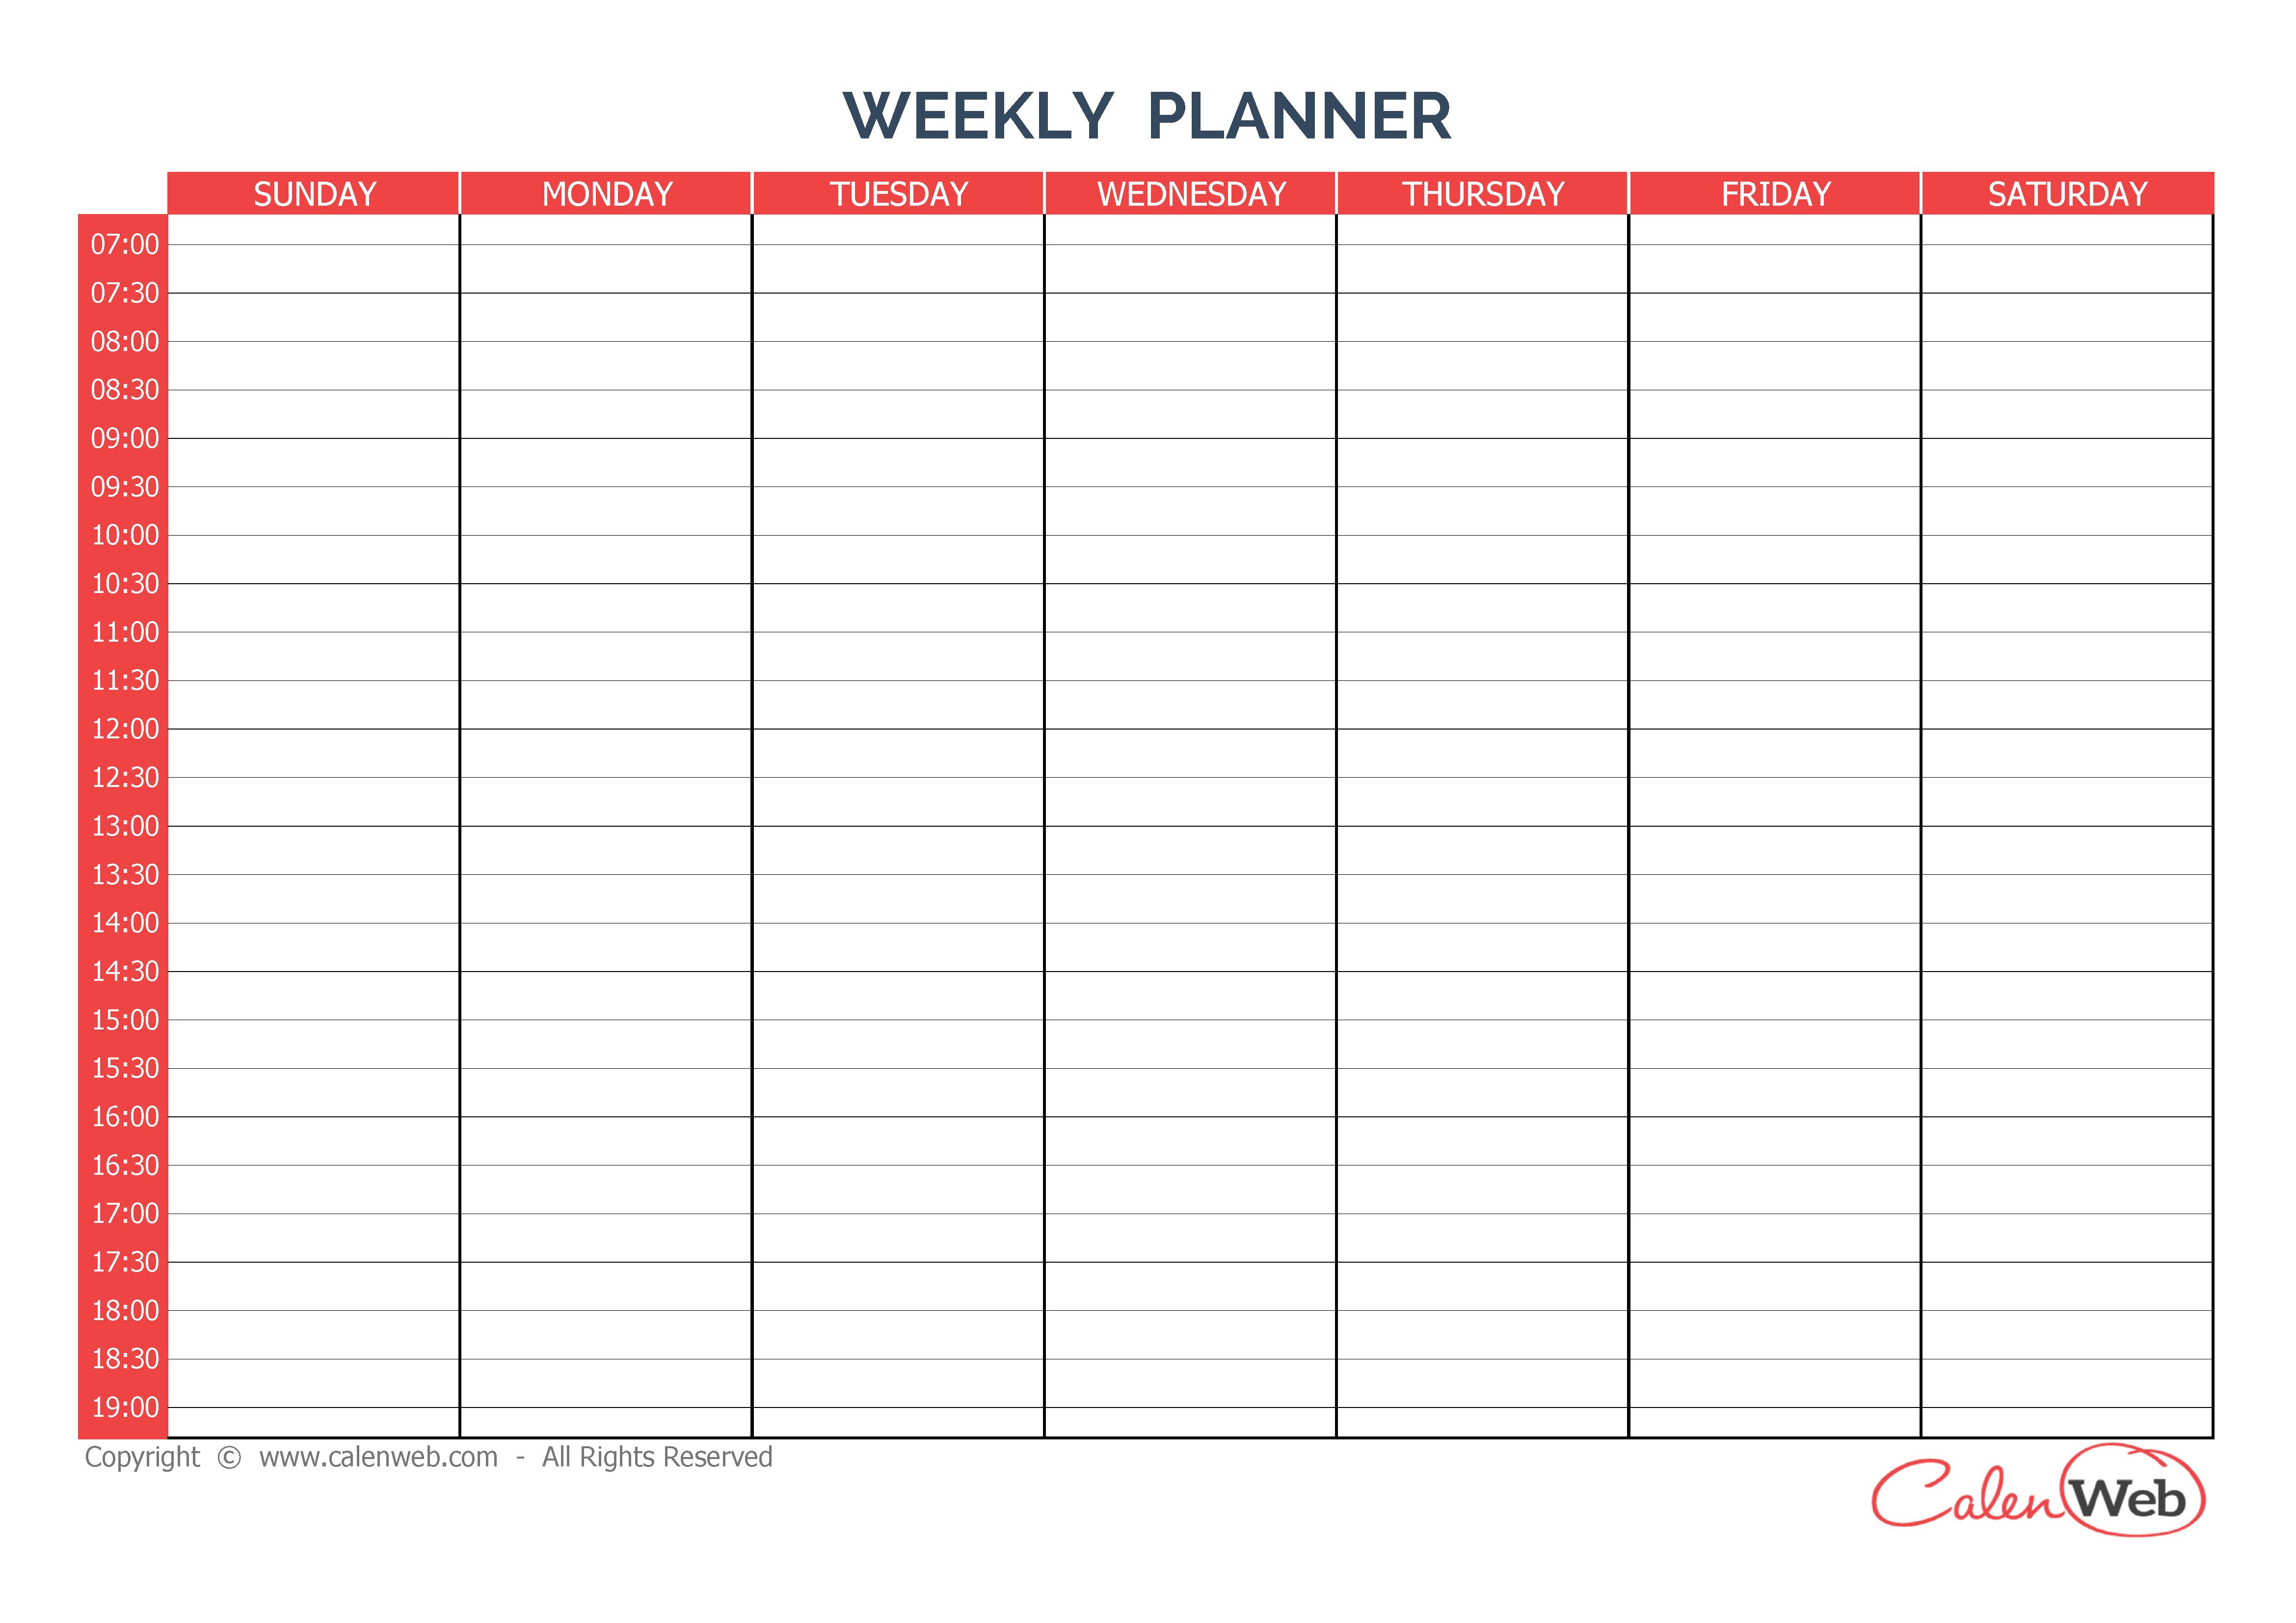 Calendriers Hebdomadaires – Calenweb Sunday Through Saturday Blanl Calendar